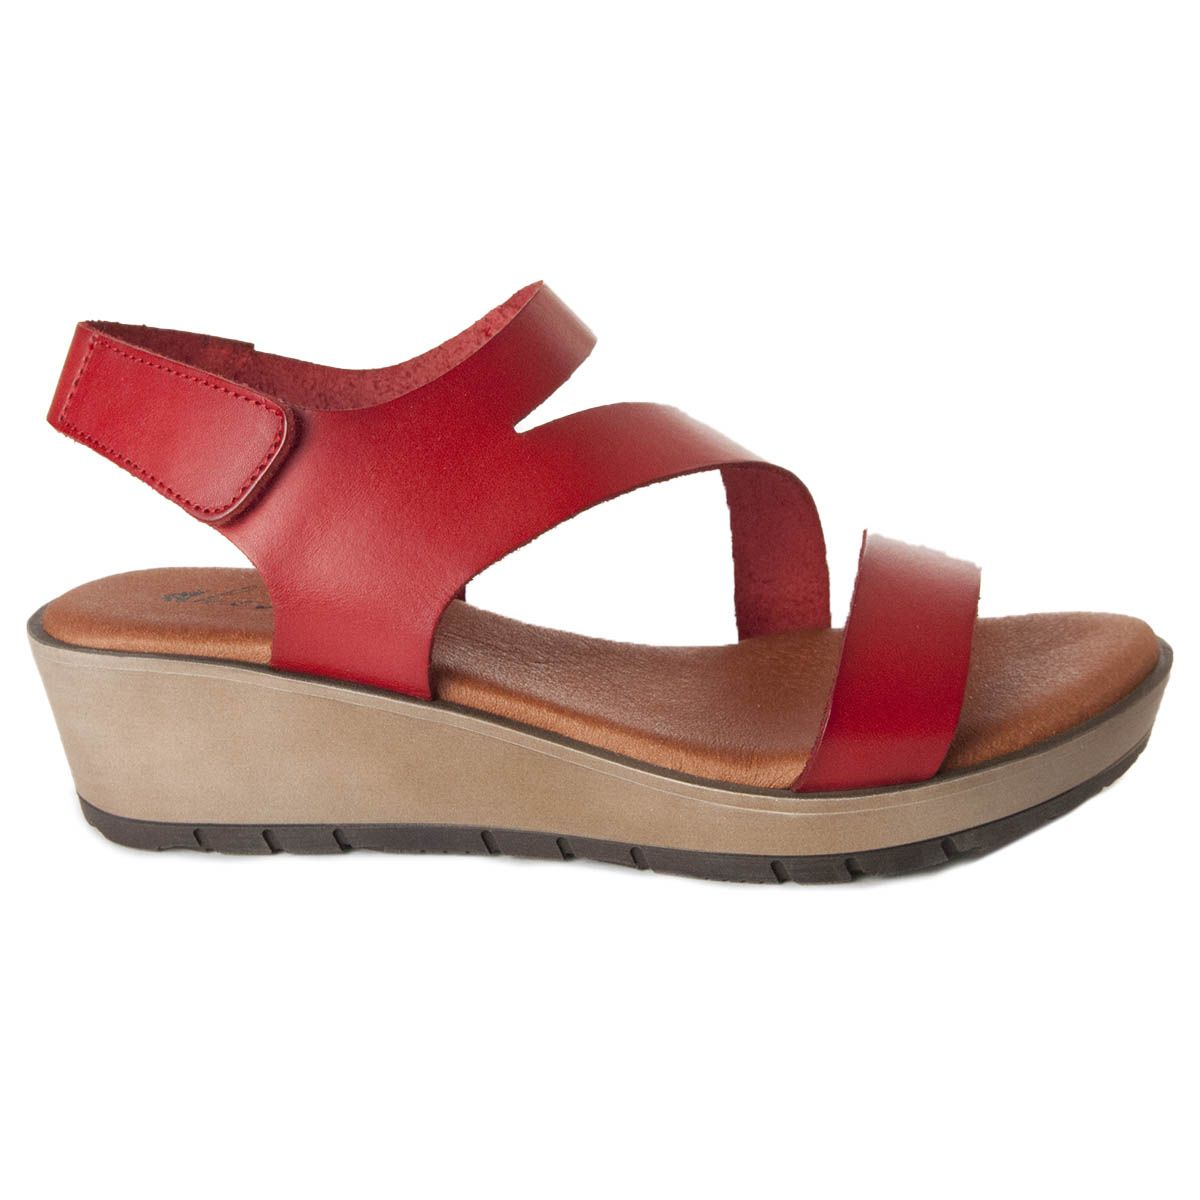 Leindia Wedge Sandal in Red